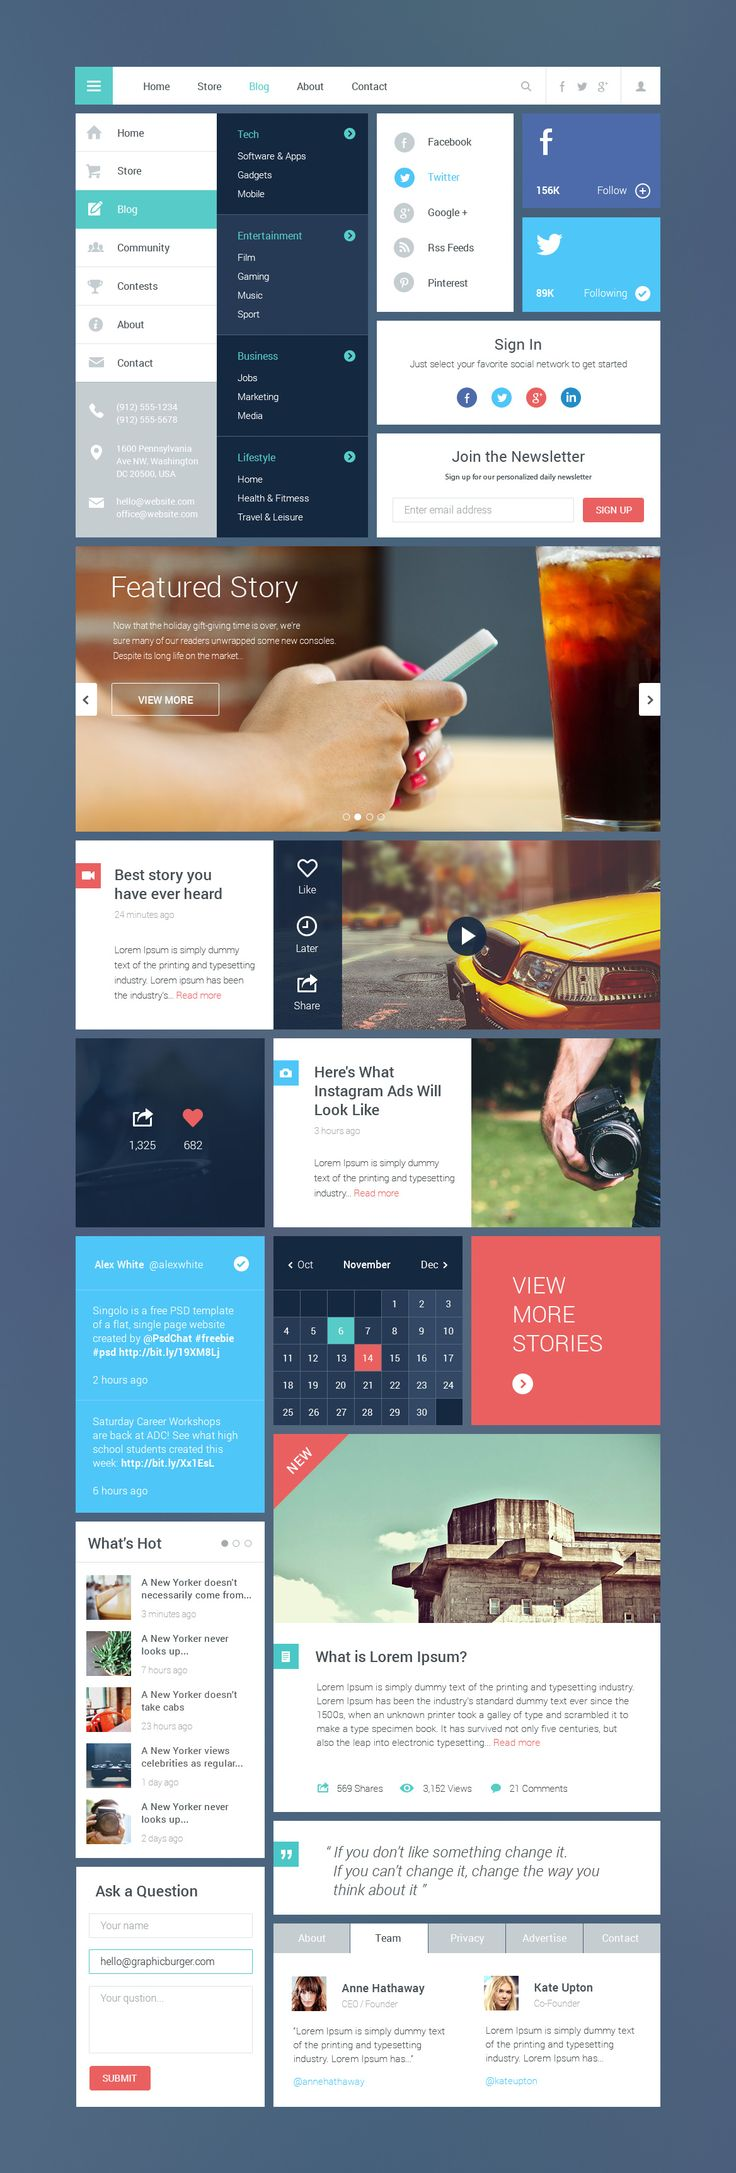 Blog UI Kit found on Dribbble.